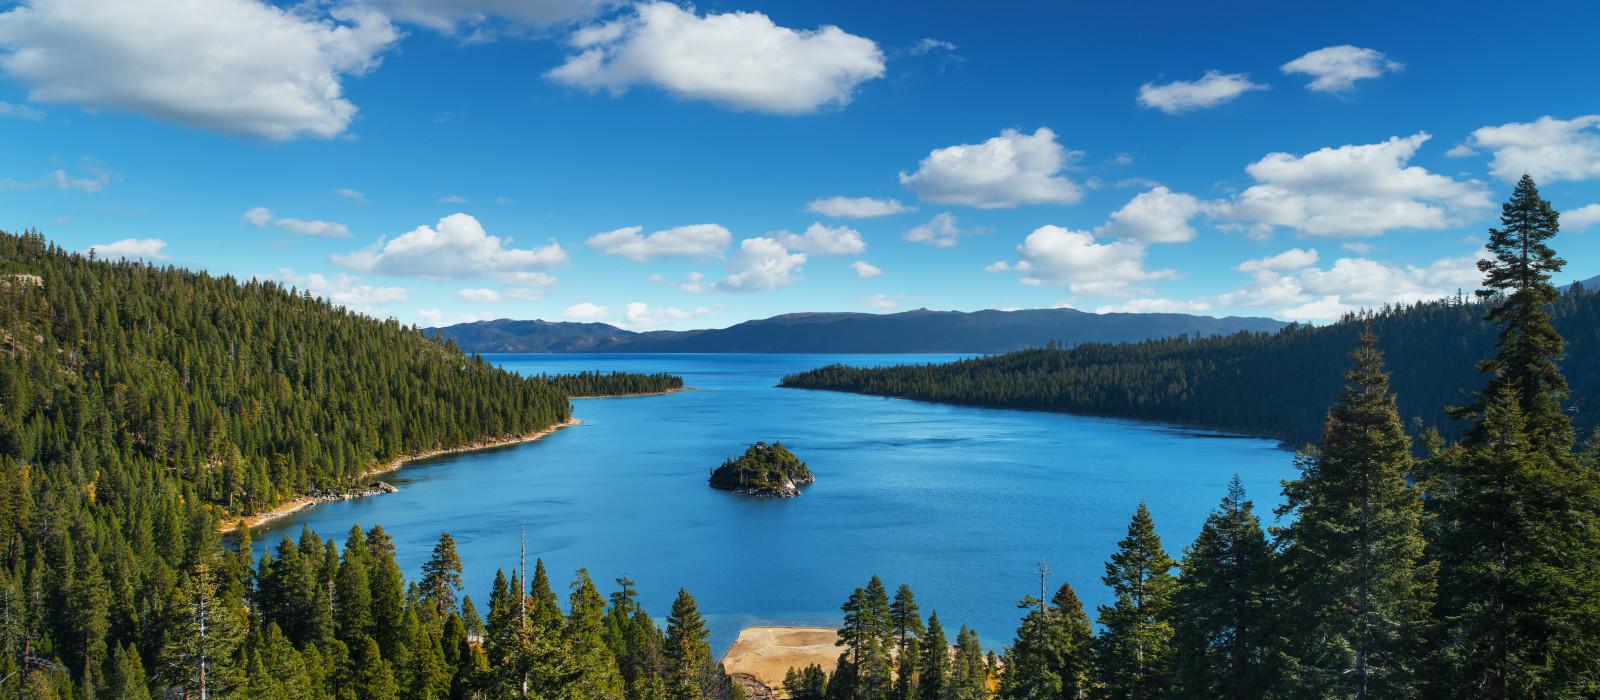 Reiseziel Lake Tahoe USA